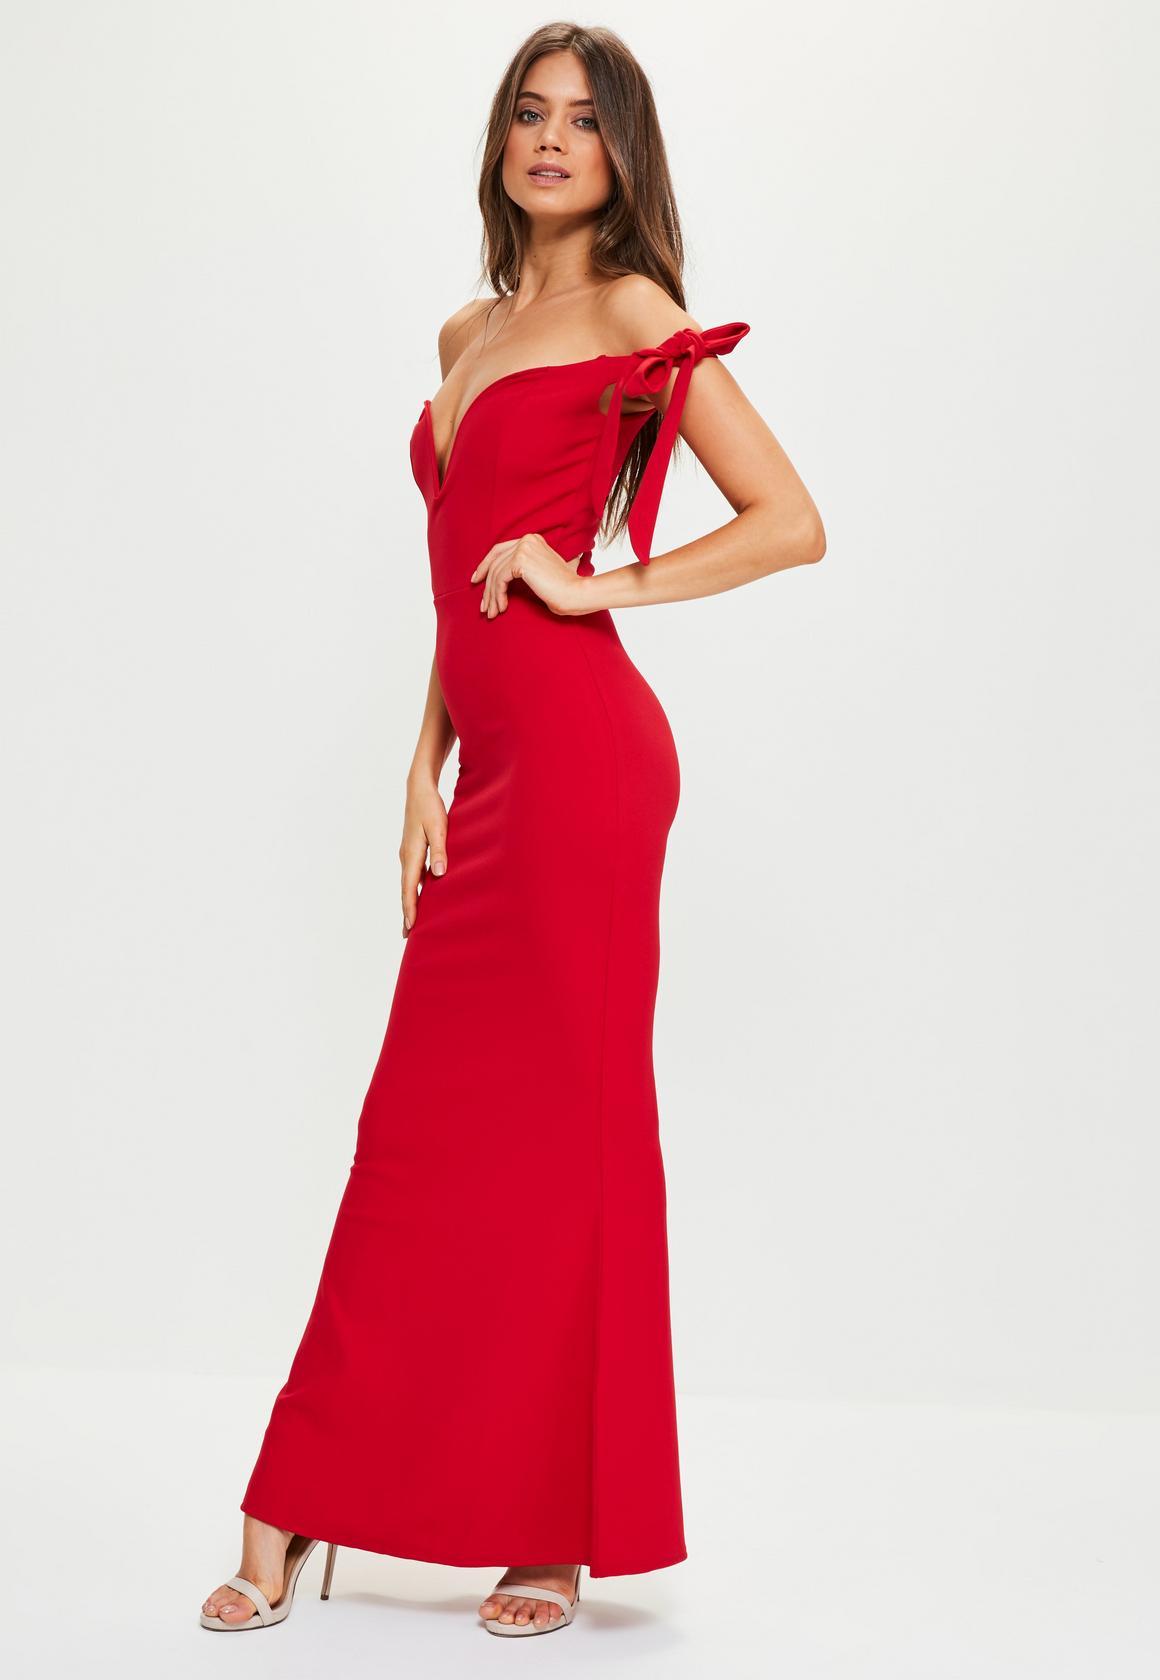 red maxi dress red sweetheart neck bardot tie maxi dress RHZAJKW